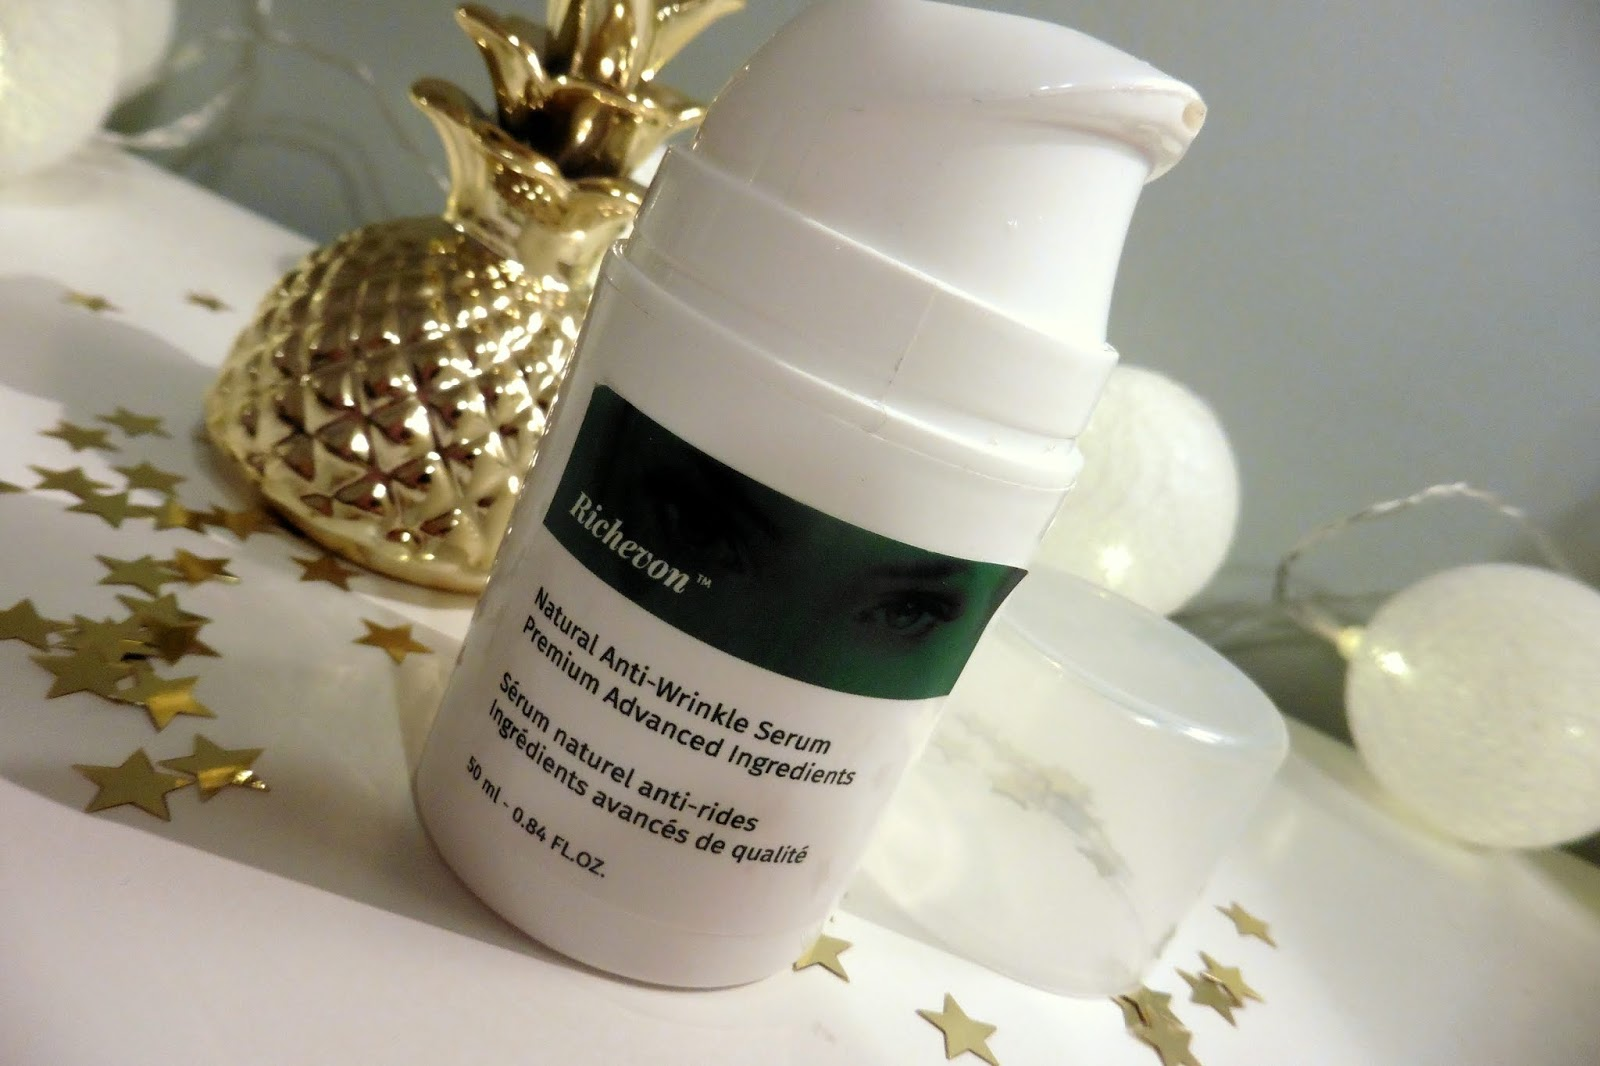 serum-przeciwzmarszczkowe-richevon